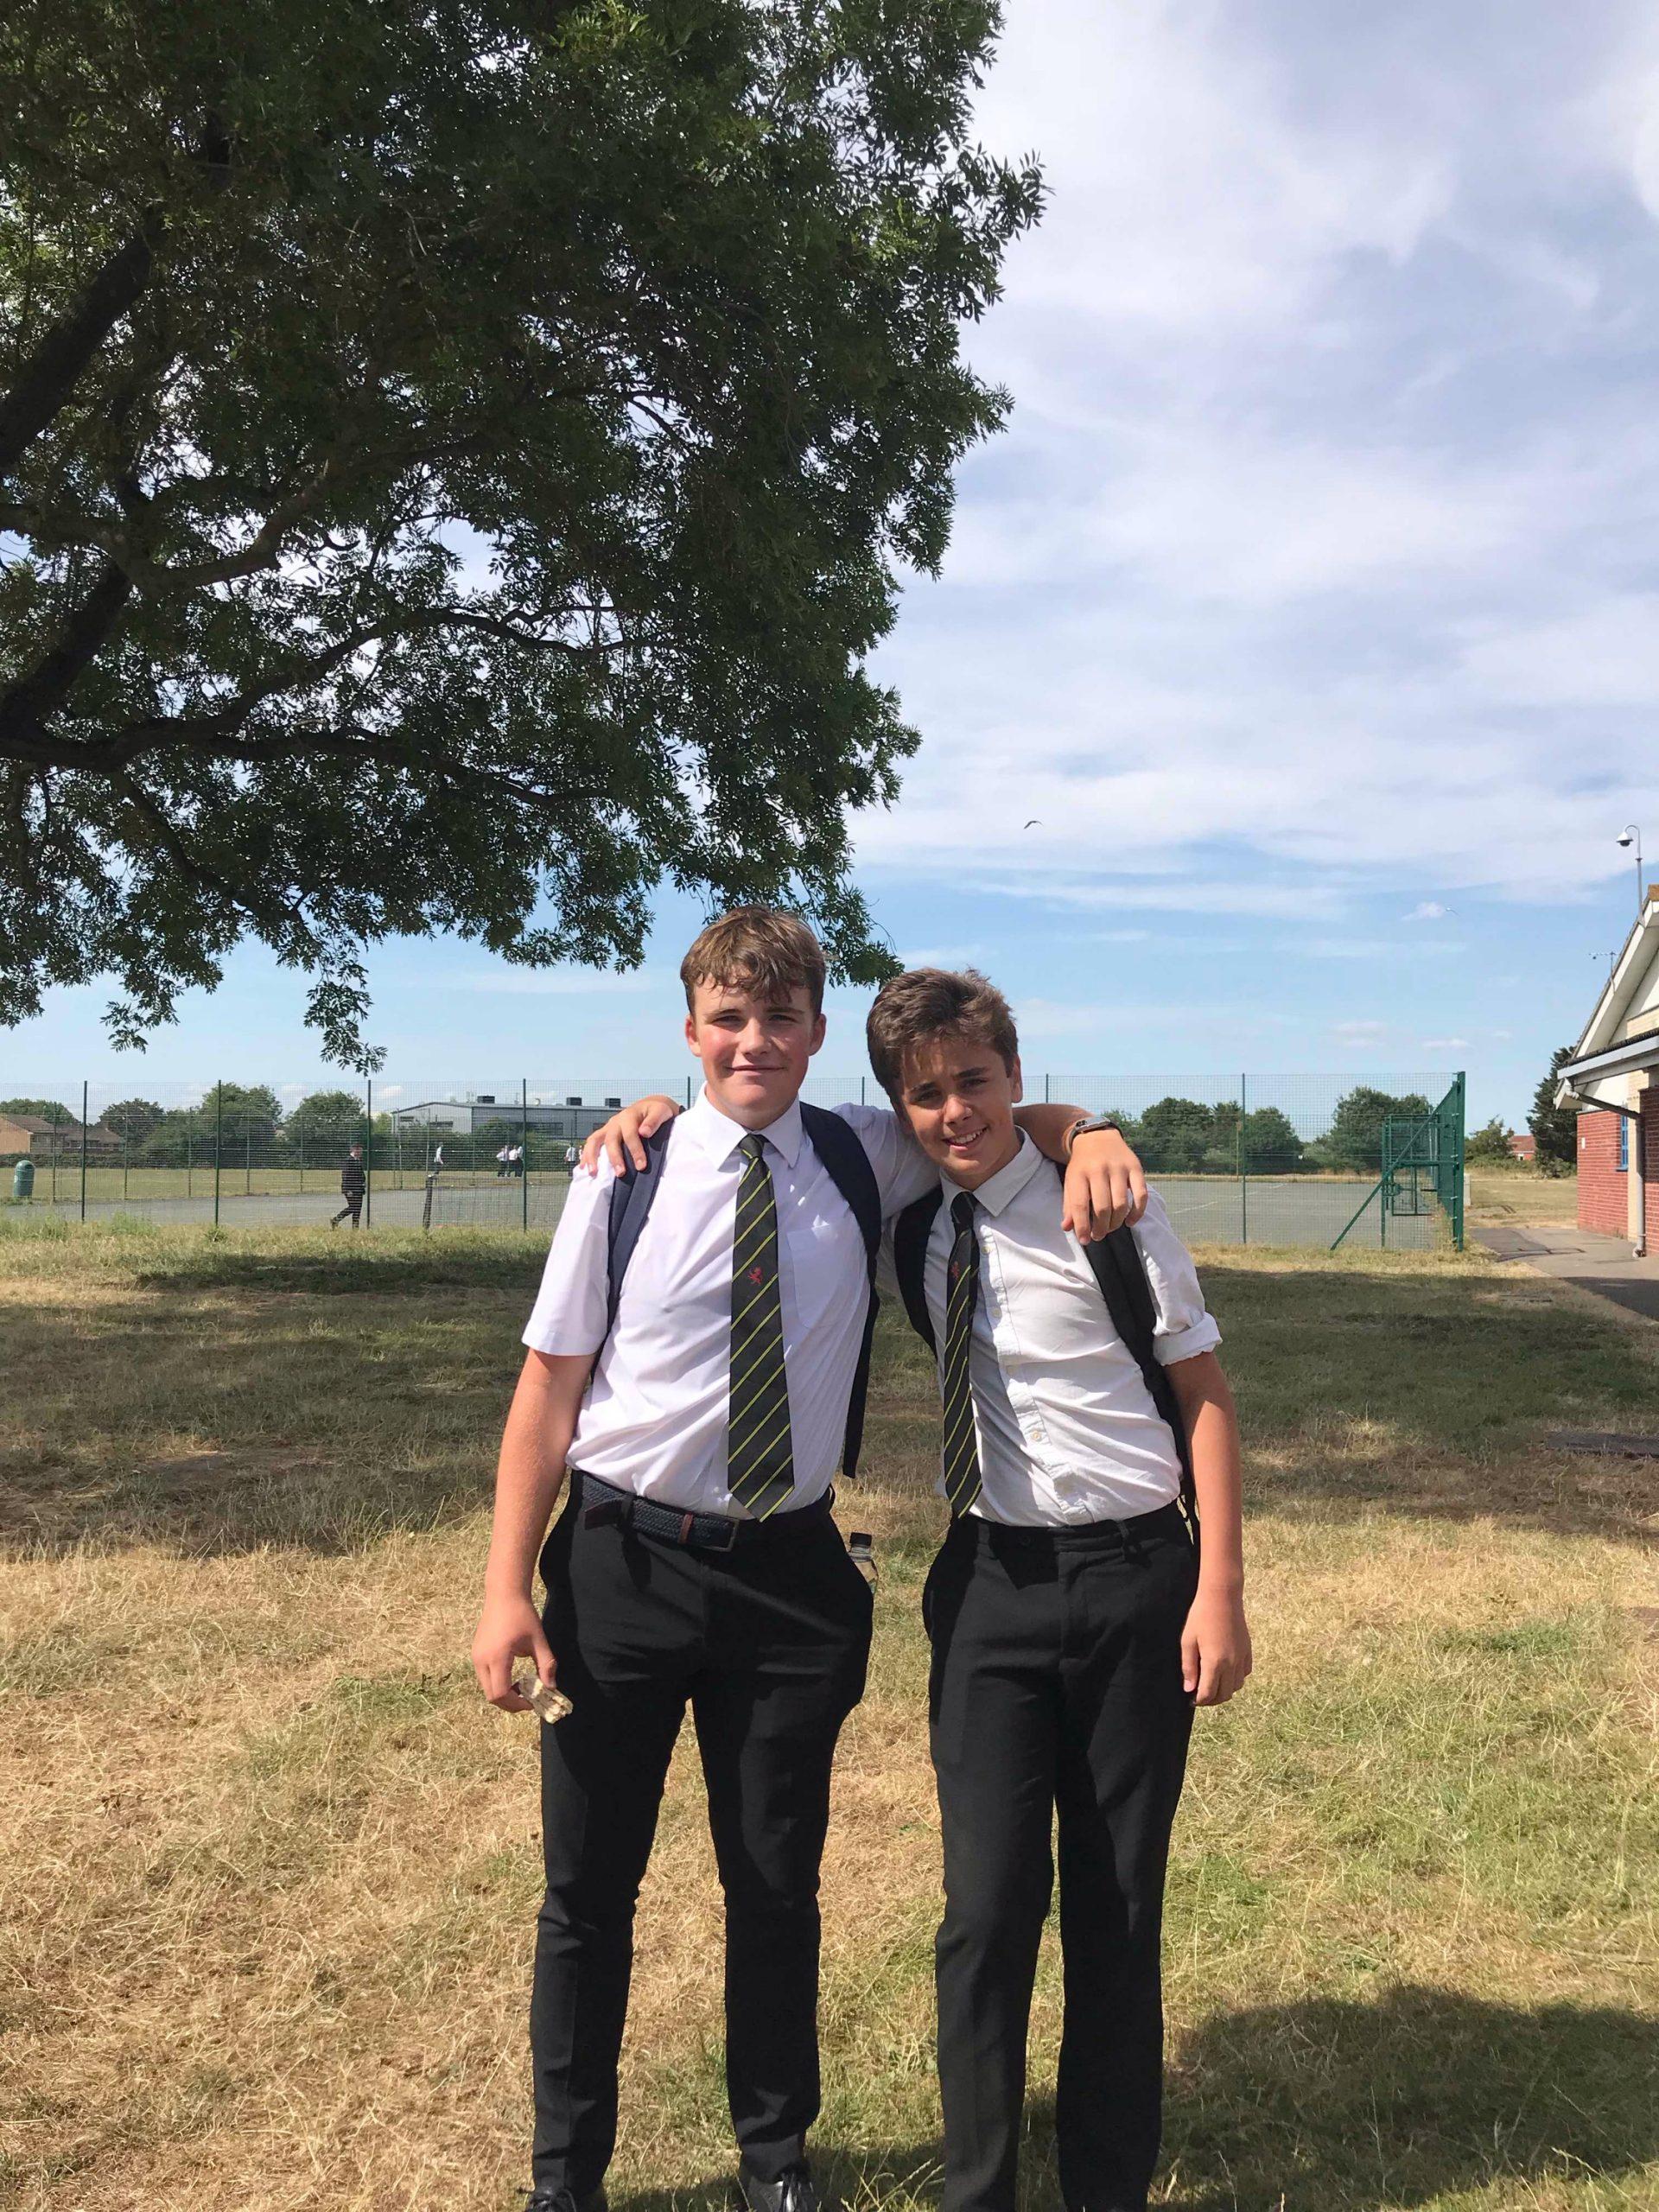 Trimestre escolar en Reino Unido